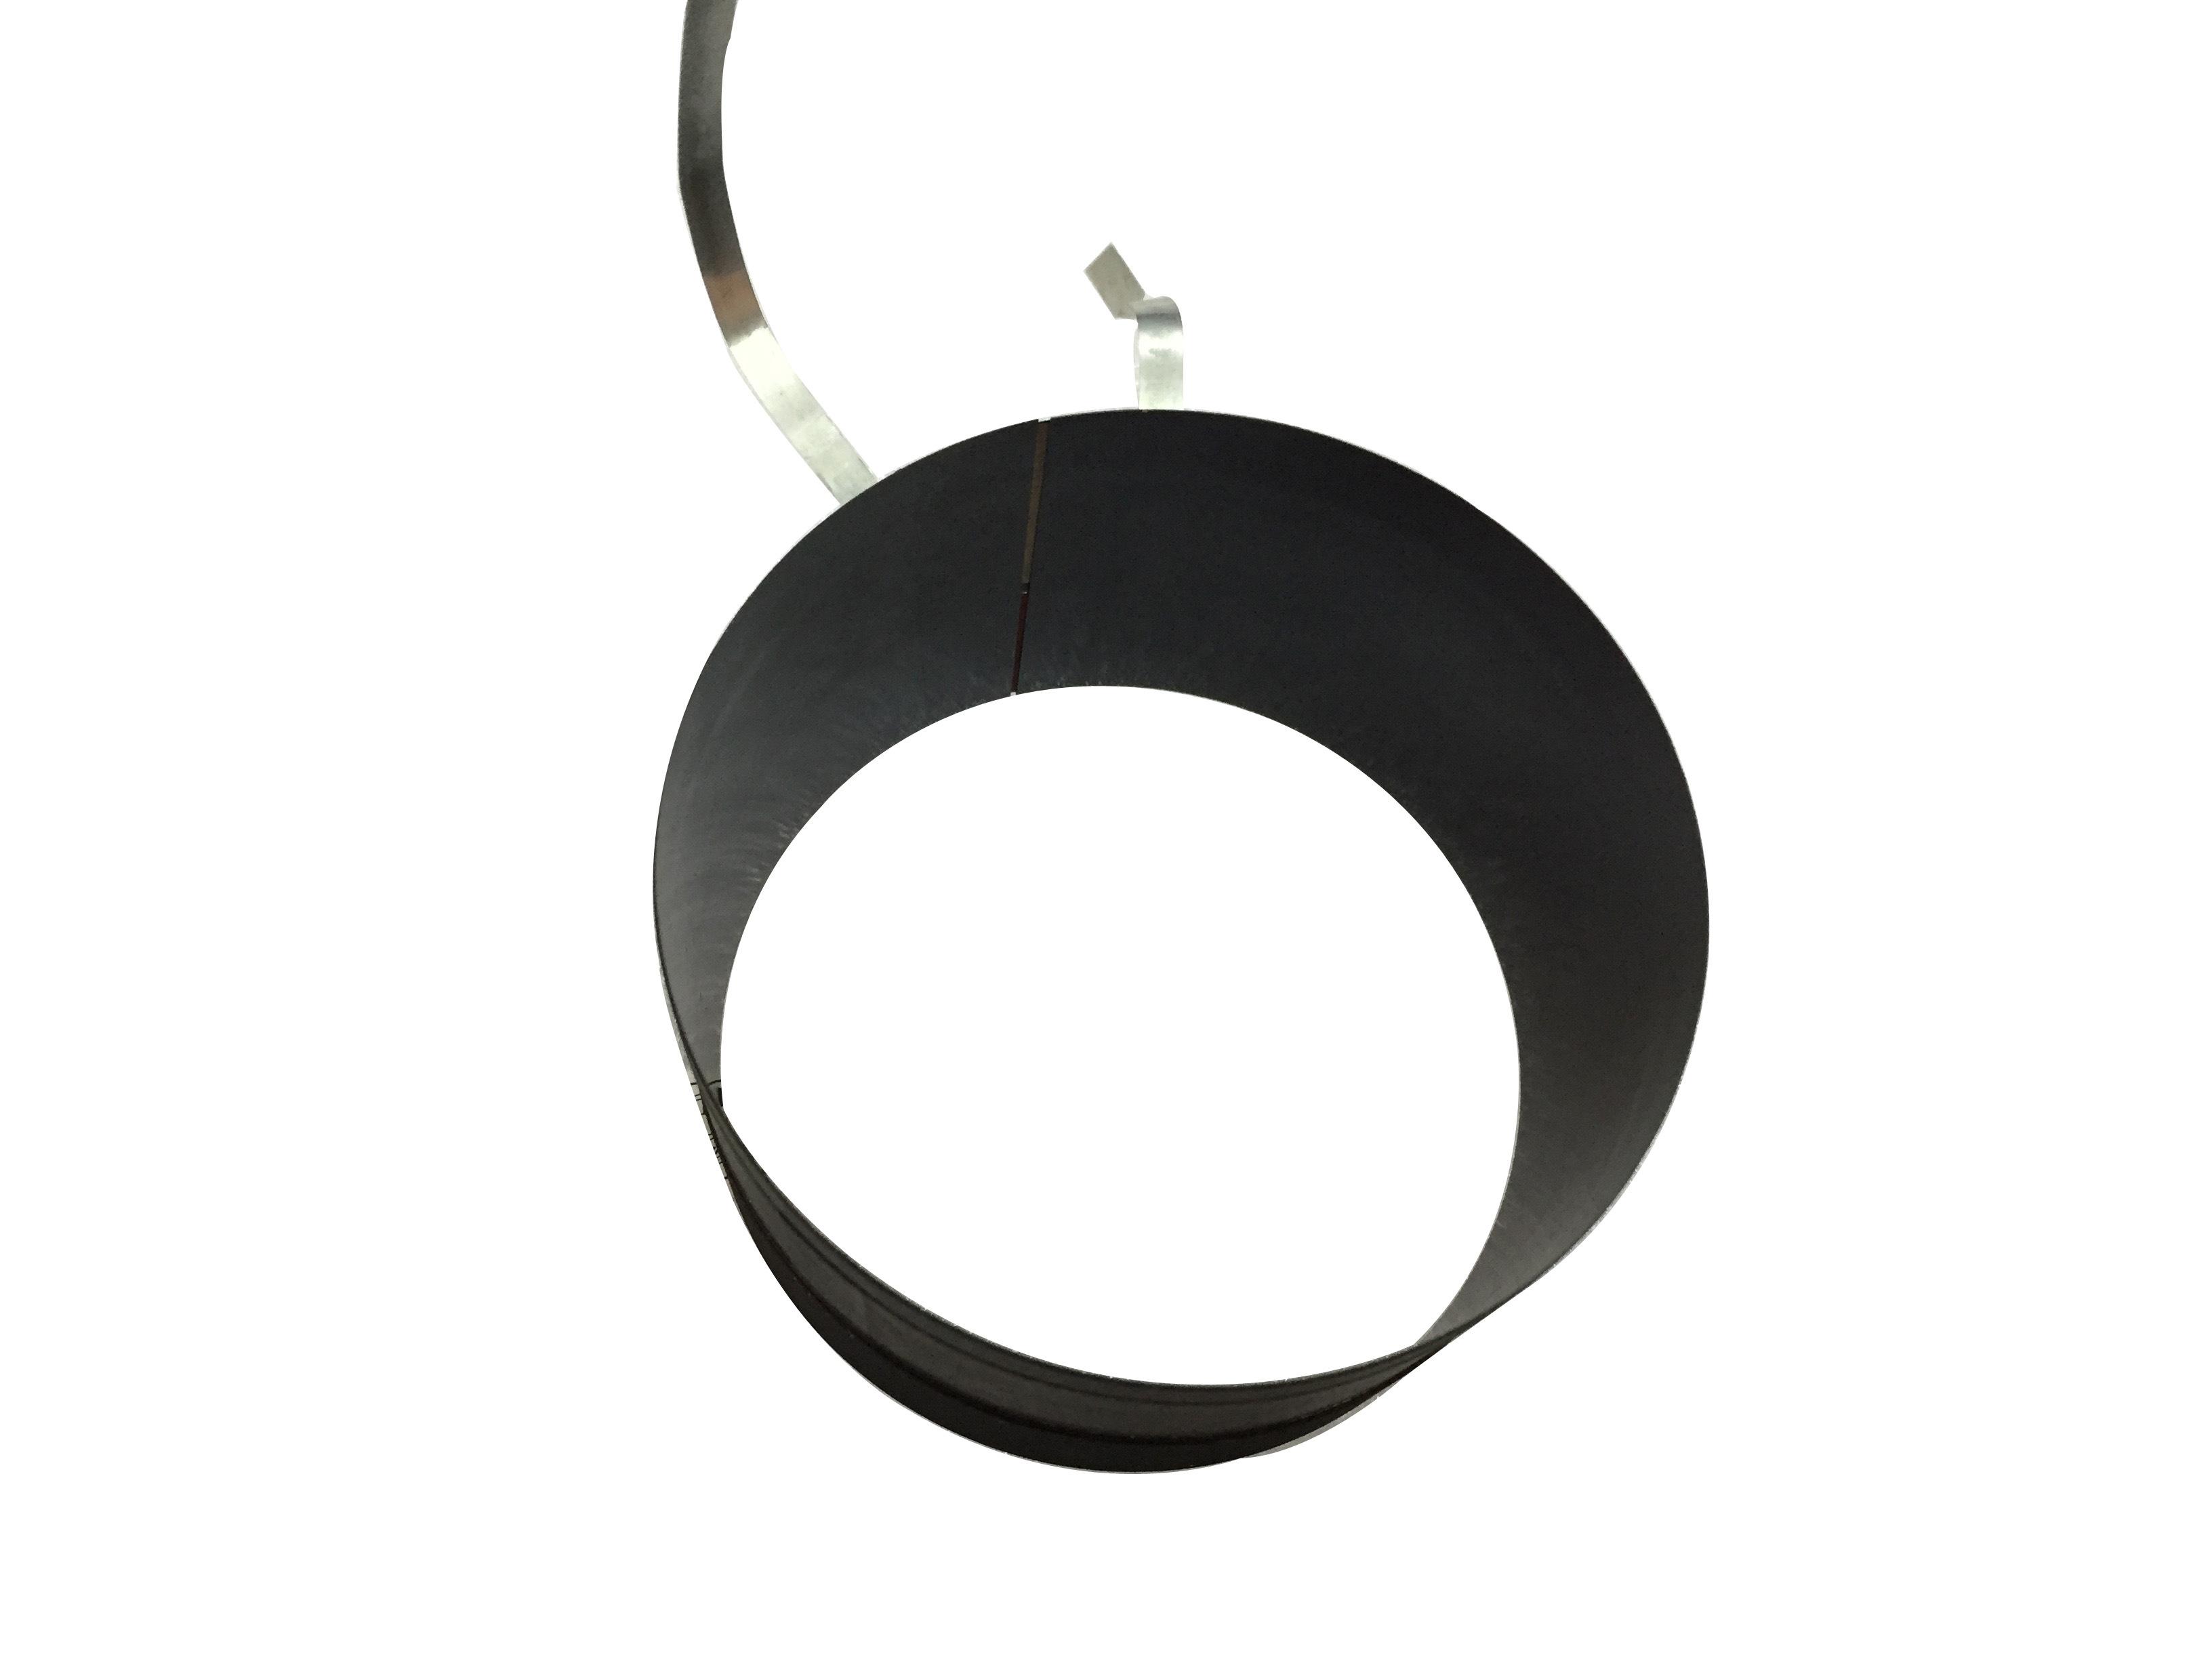 Speaker Parts 3 Inch Voice Coil - Speaker Parts